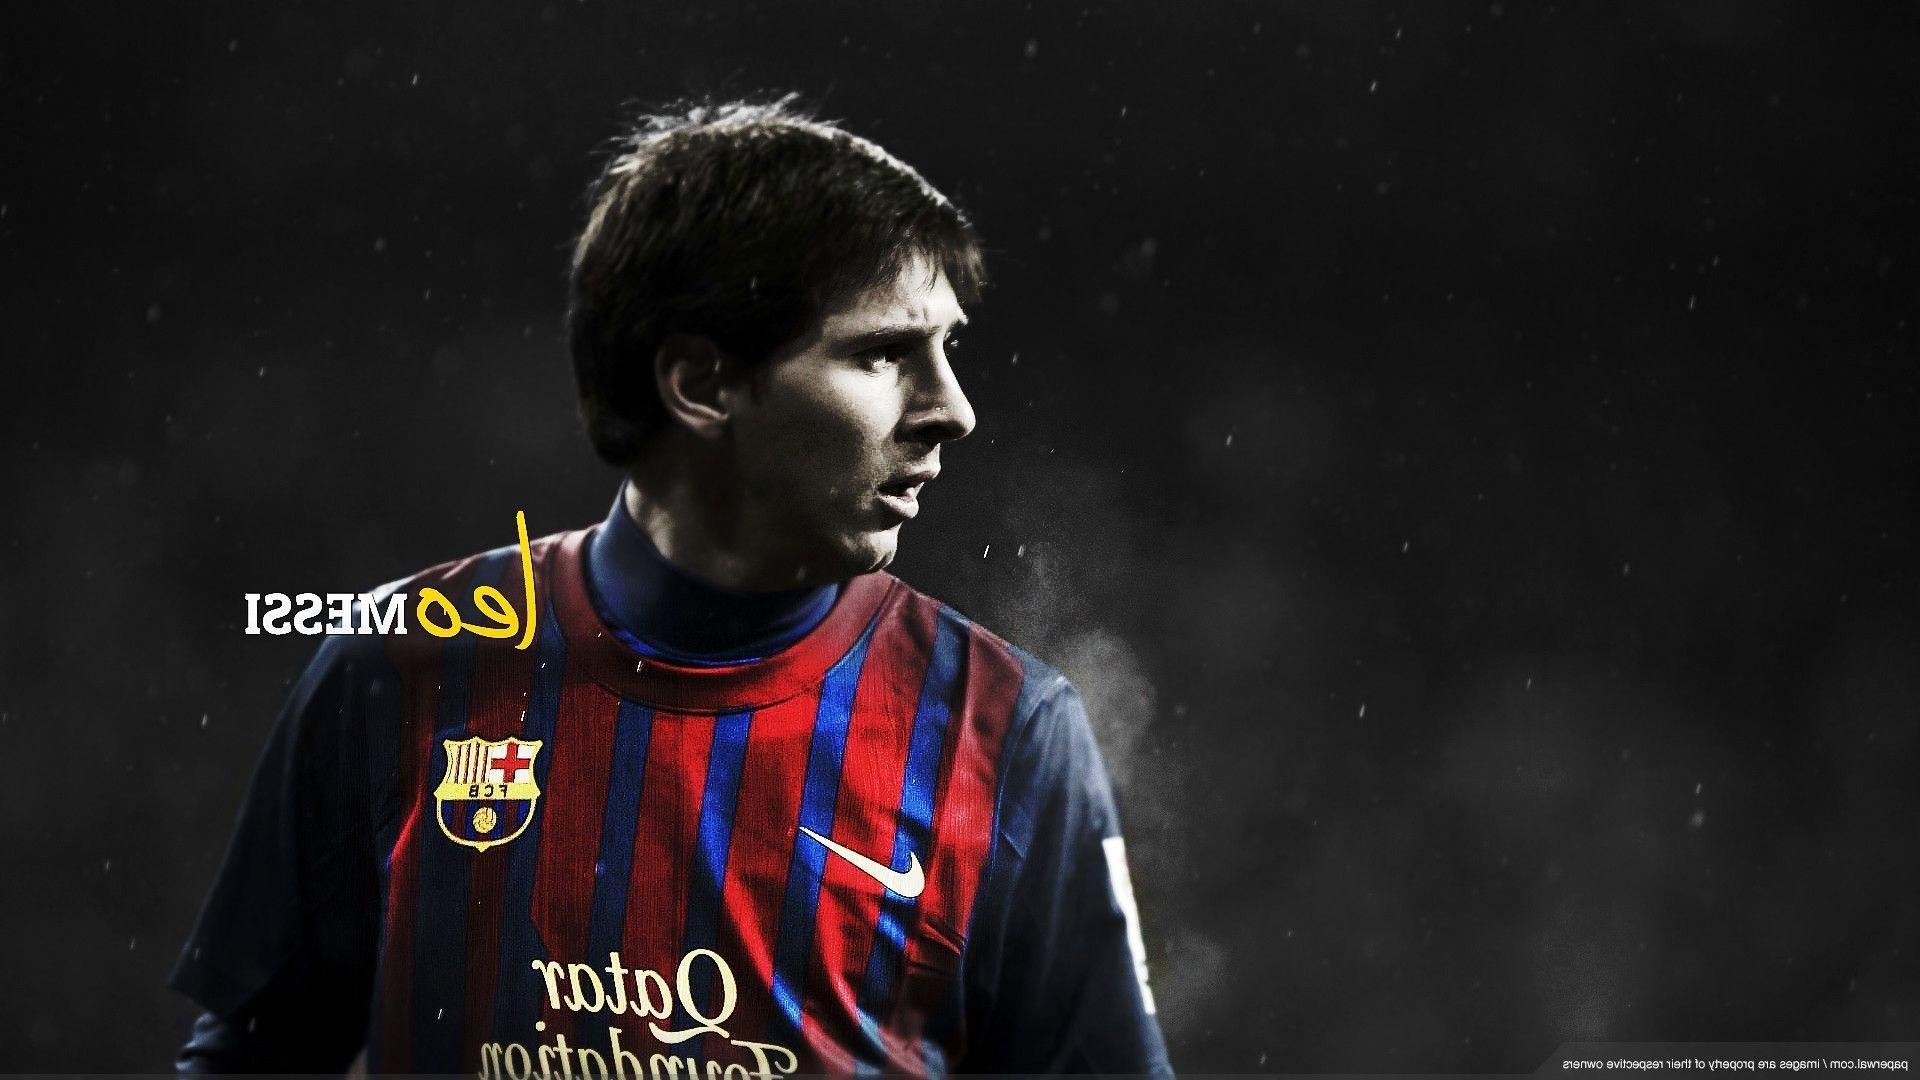 1920x1200 Adidas Soccer Wallpaper High Resolution For Desktop 1920 X 1200 Px 69231 KB Tumblr Messi